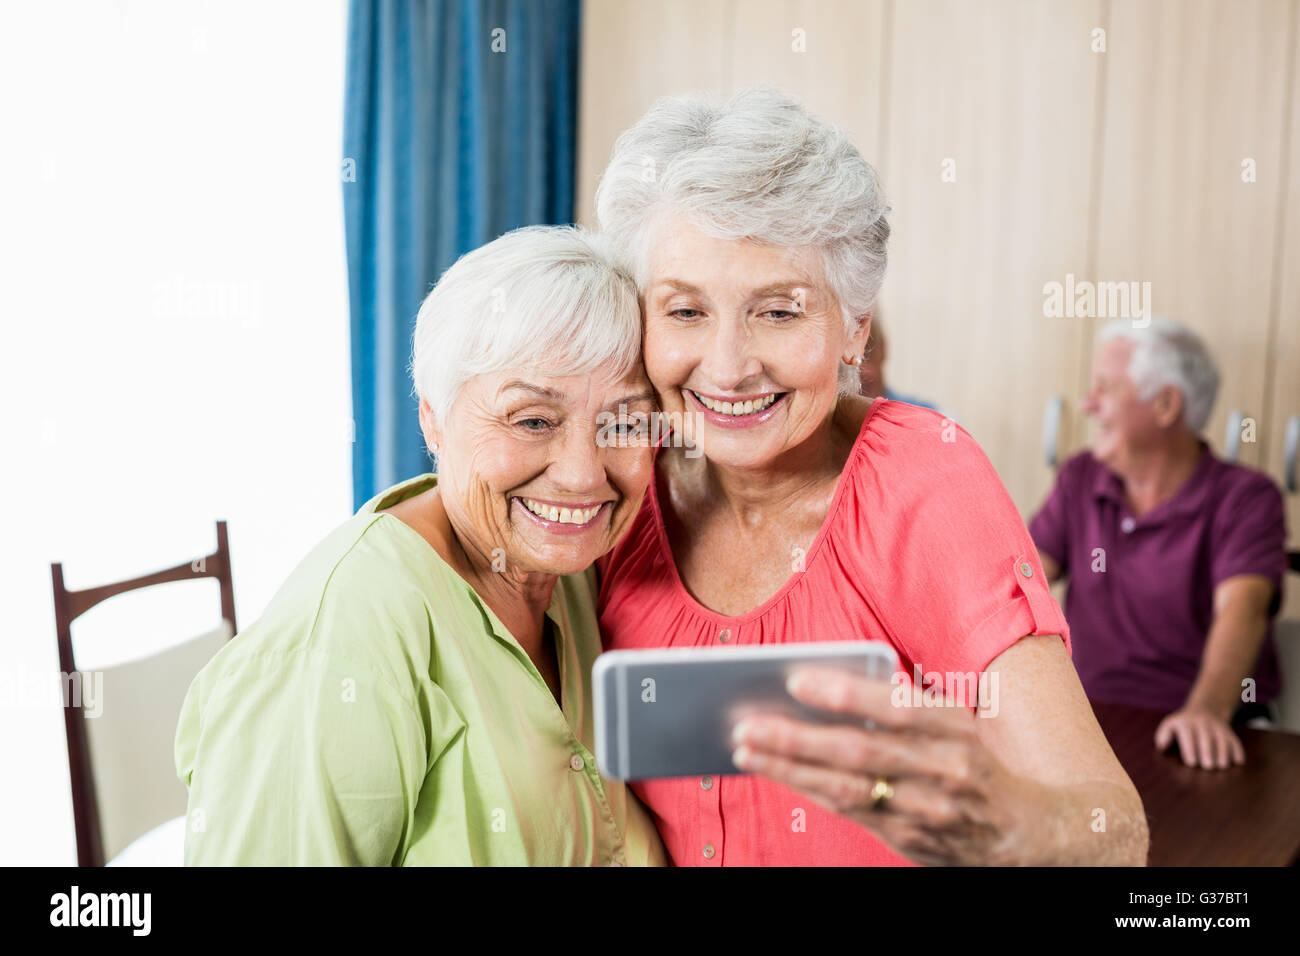 Senior women taking a selfie - Stock Image